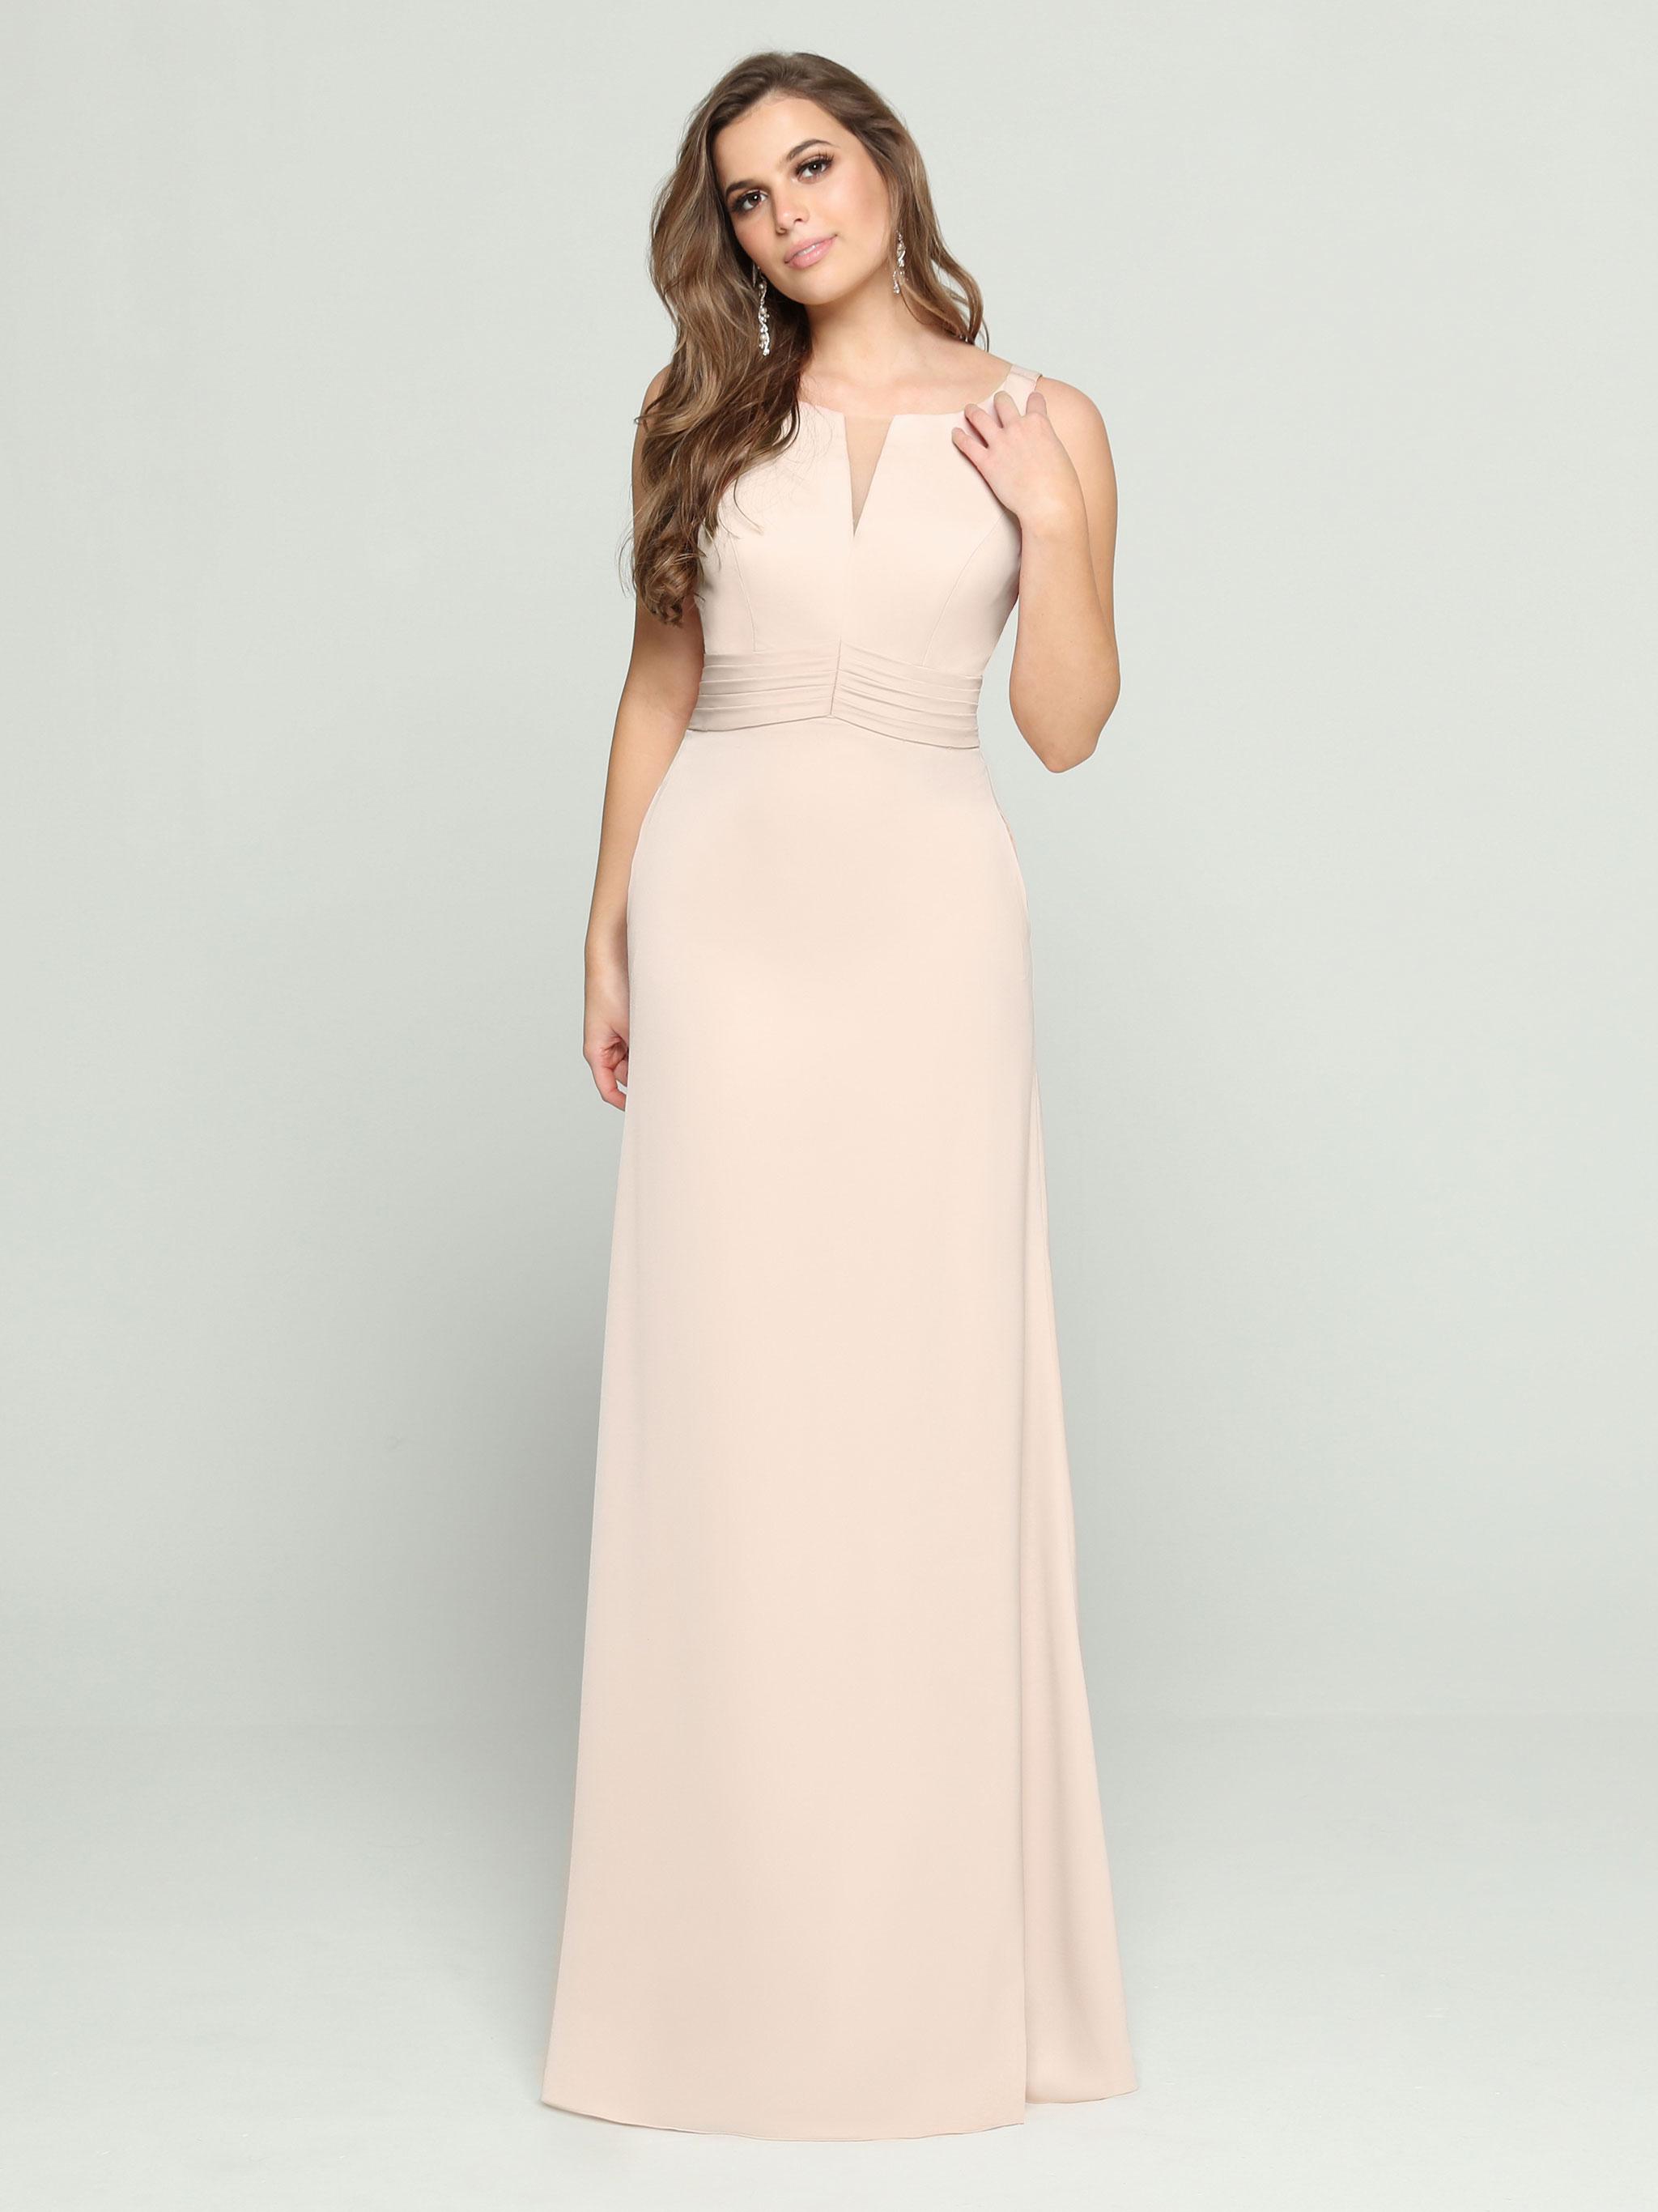 Style #60463